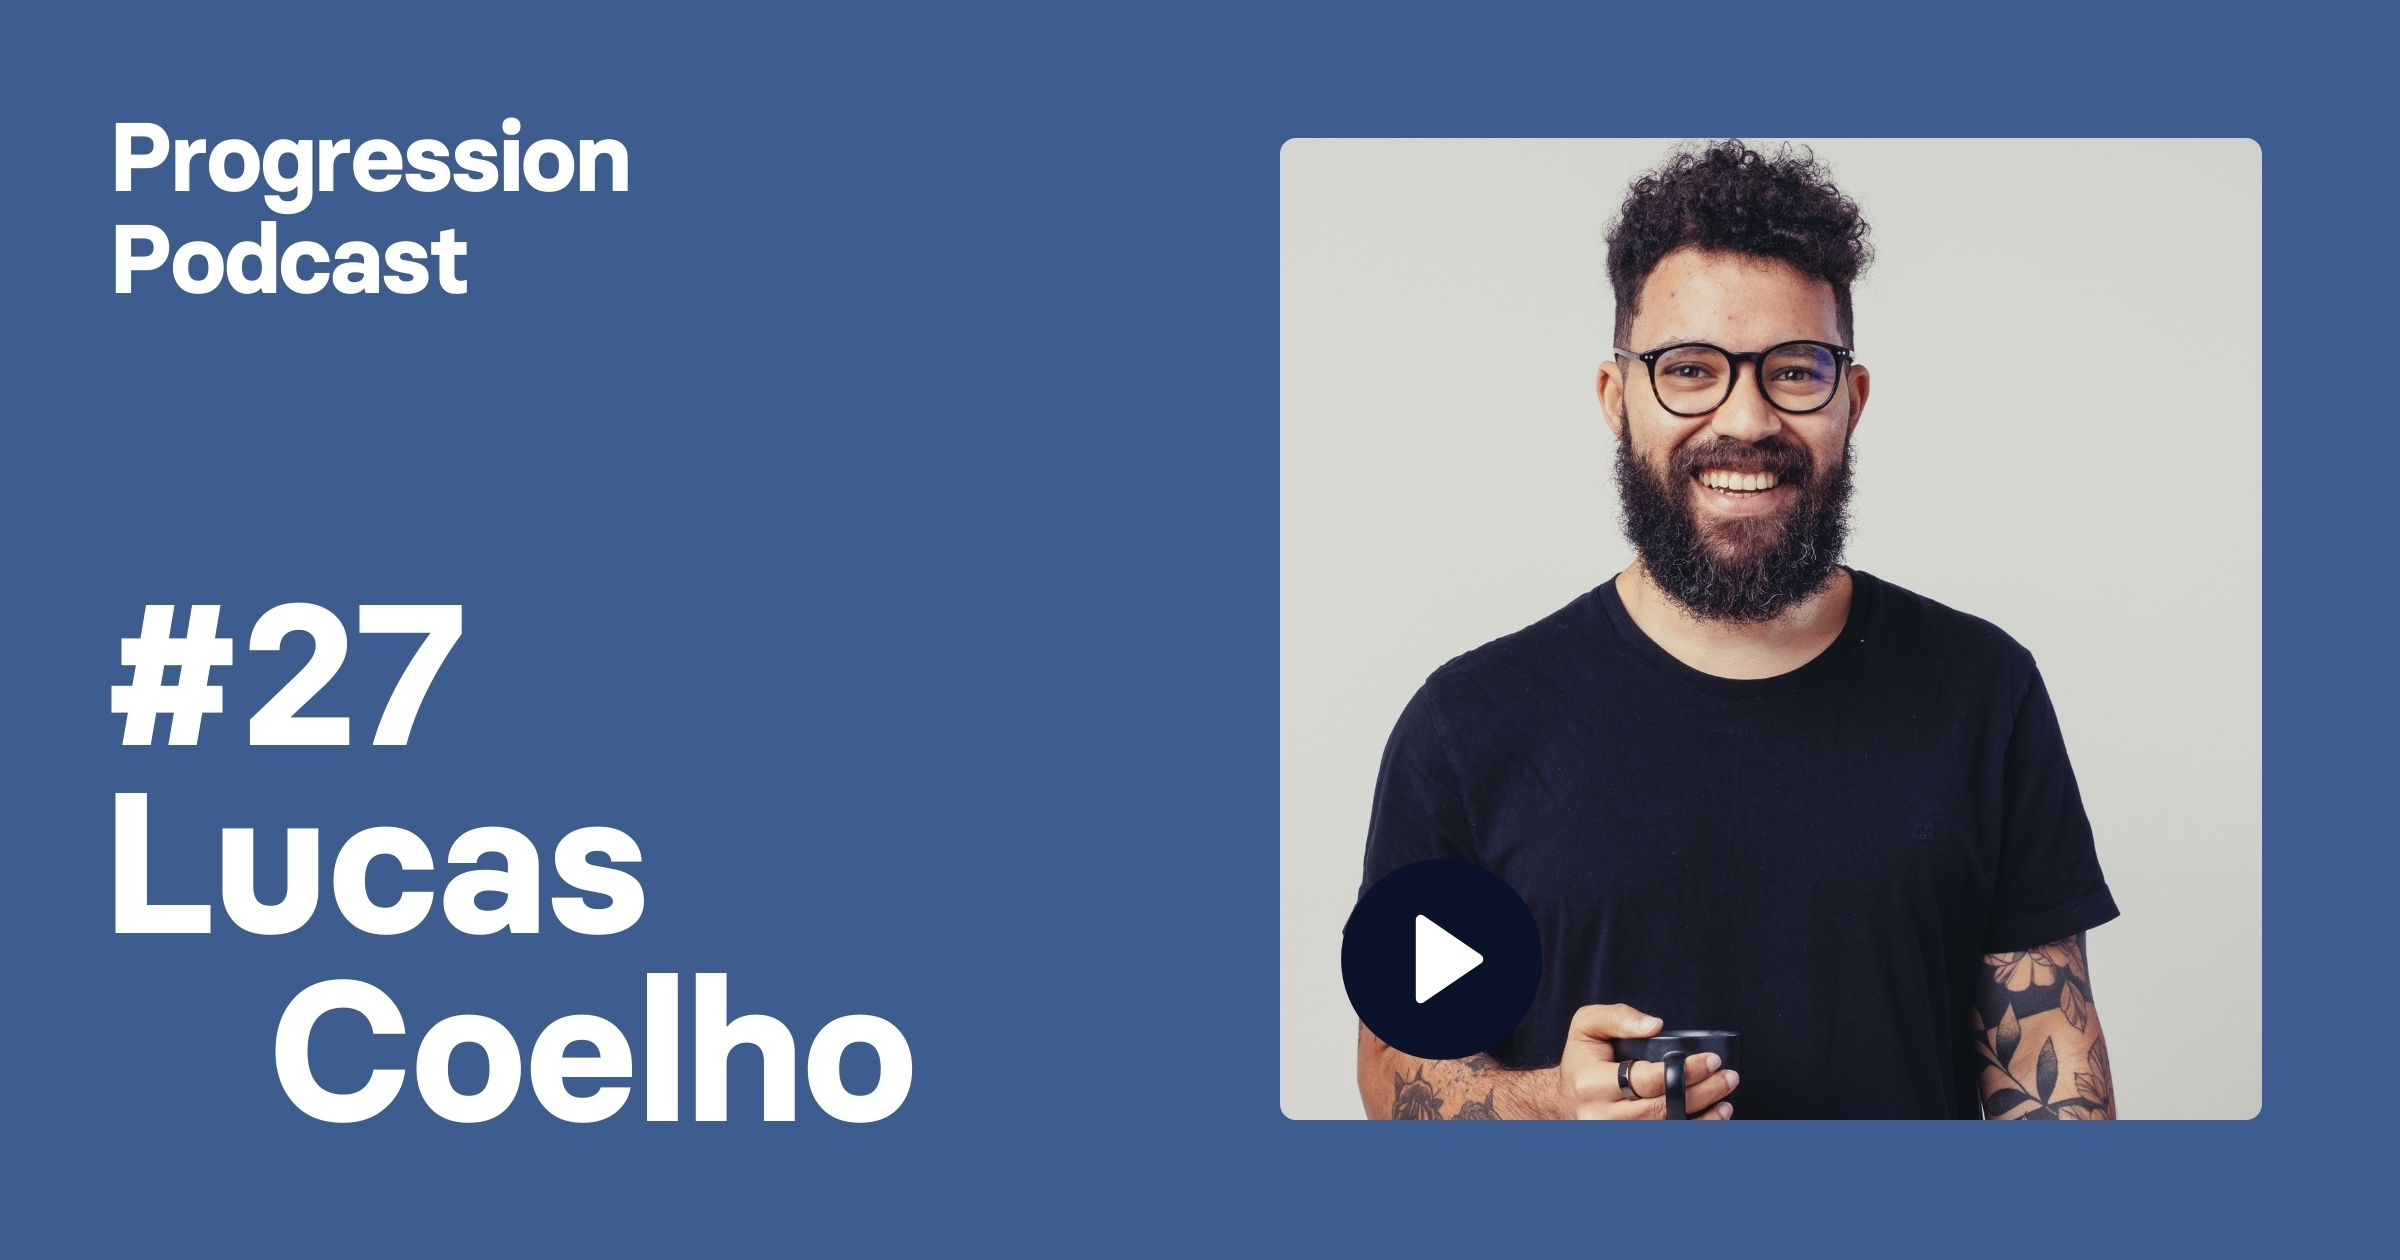 #27 Lucas Coelho (Roam Digital) on building an academy, leadership lessons and how to run a happy team